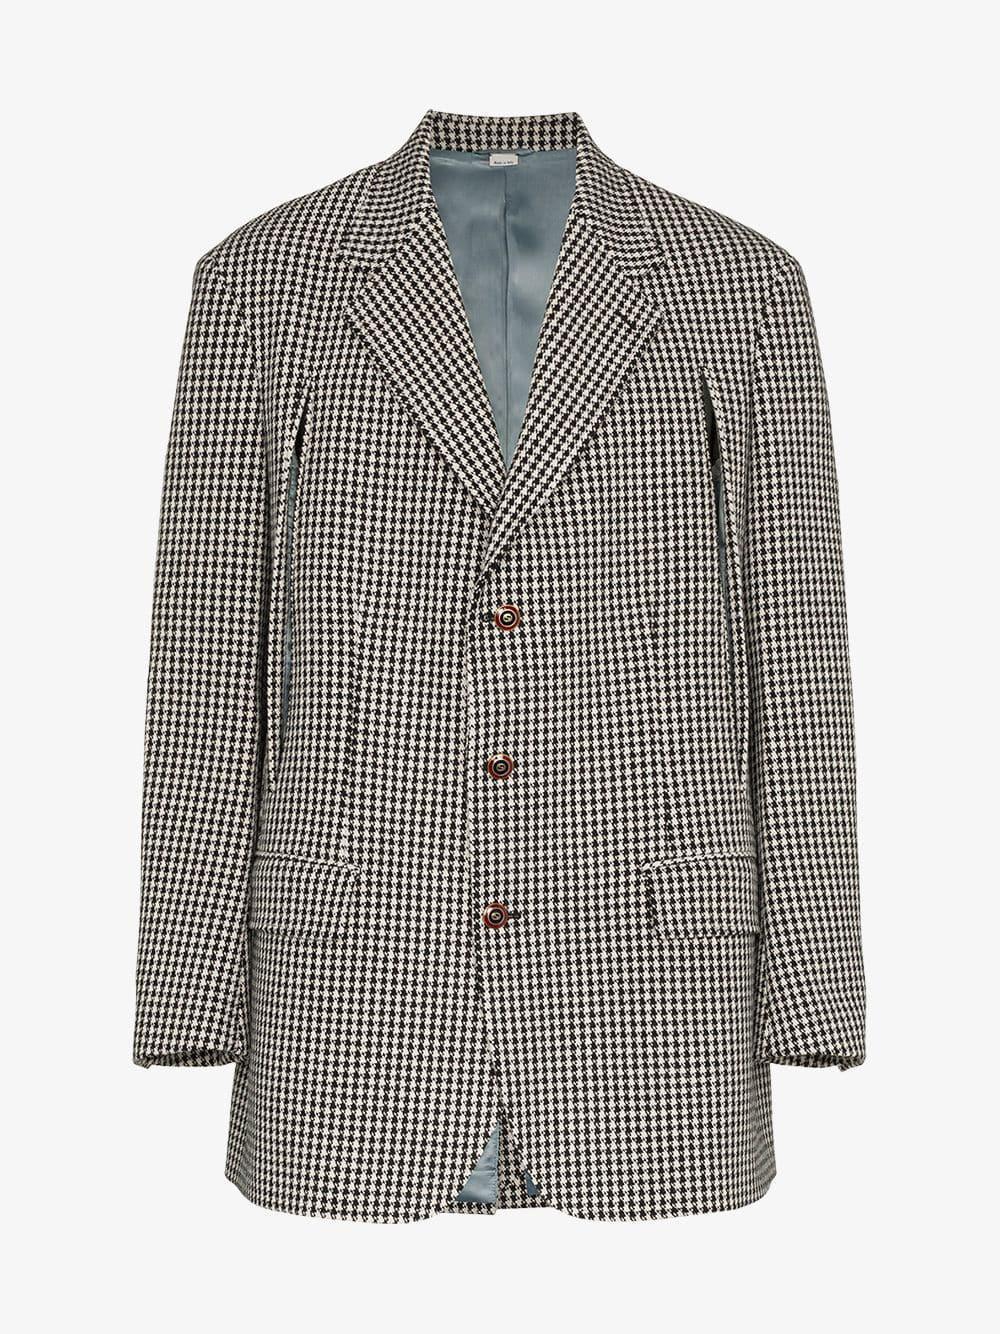 a51d8fb31cf2 Gucci - Black Check Slit Wool Cashmere Blend Jacket for Men - Lyst. View  fullscreen